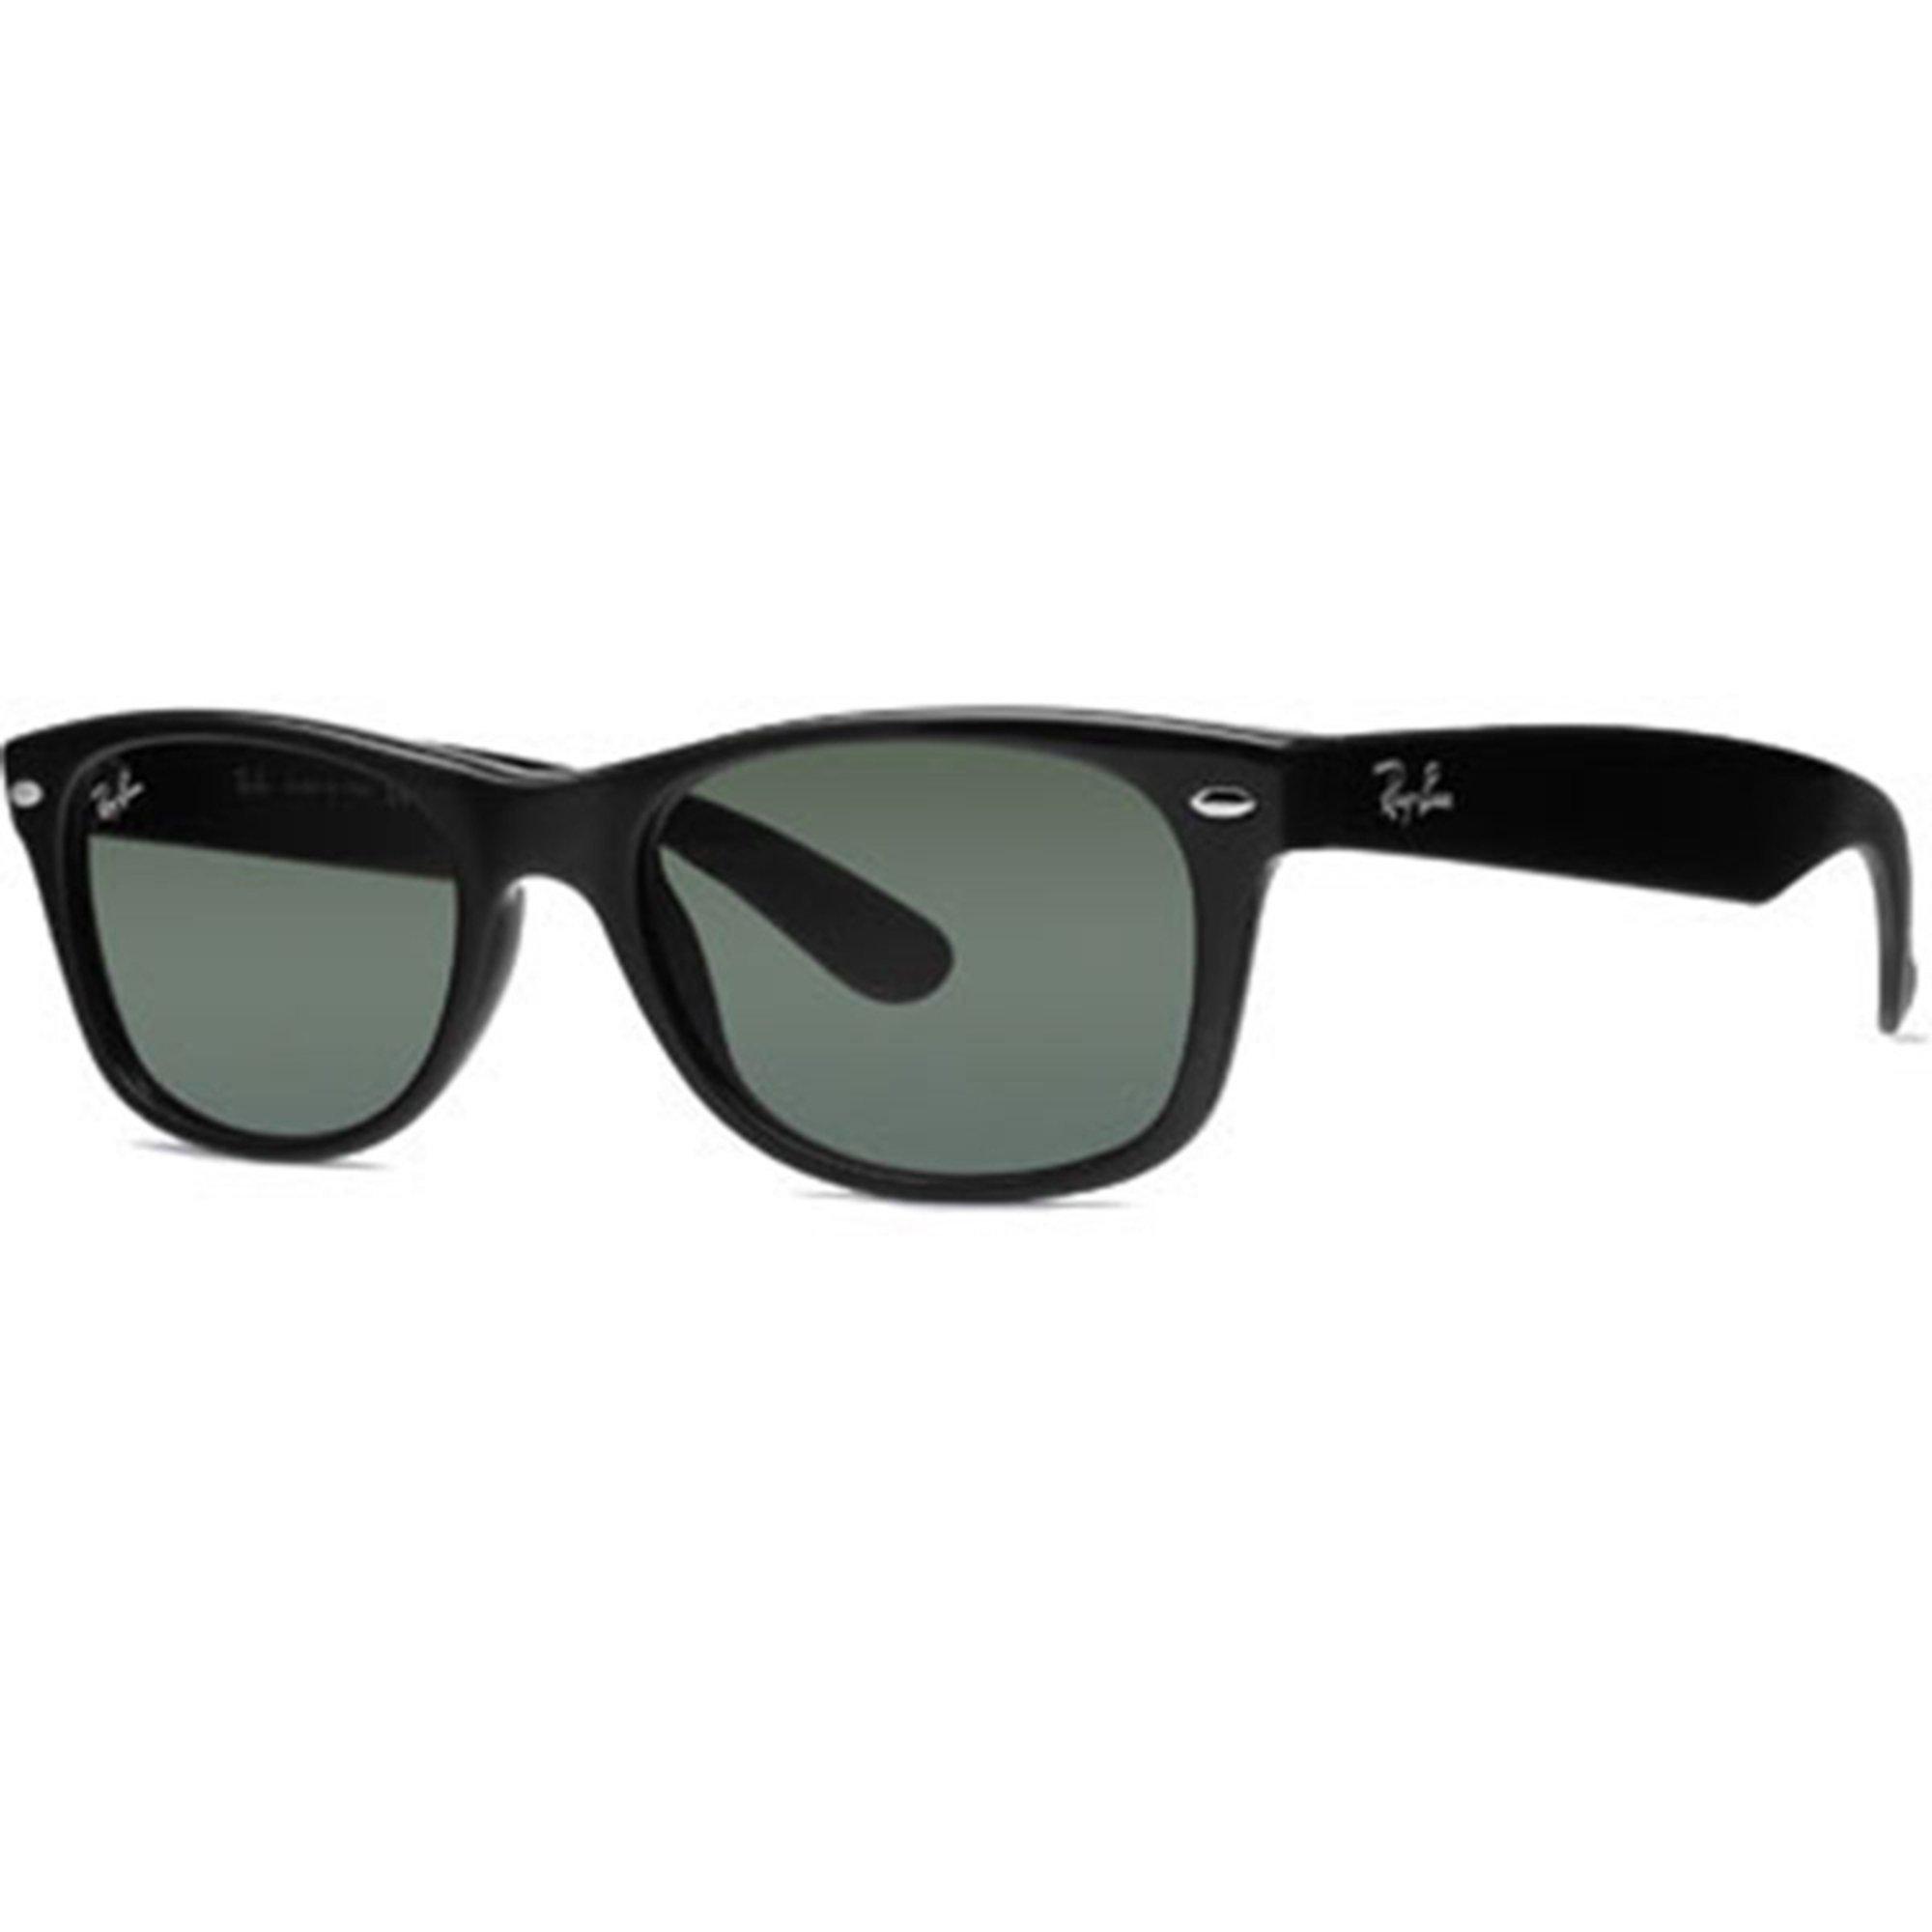 Ray-ban Men s Wayfarer Classic Sunglasses  7e283a743